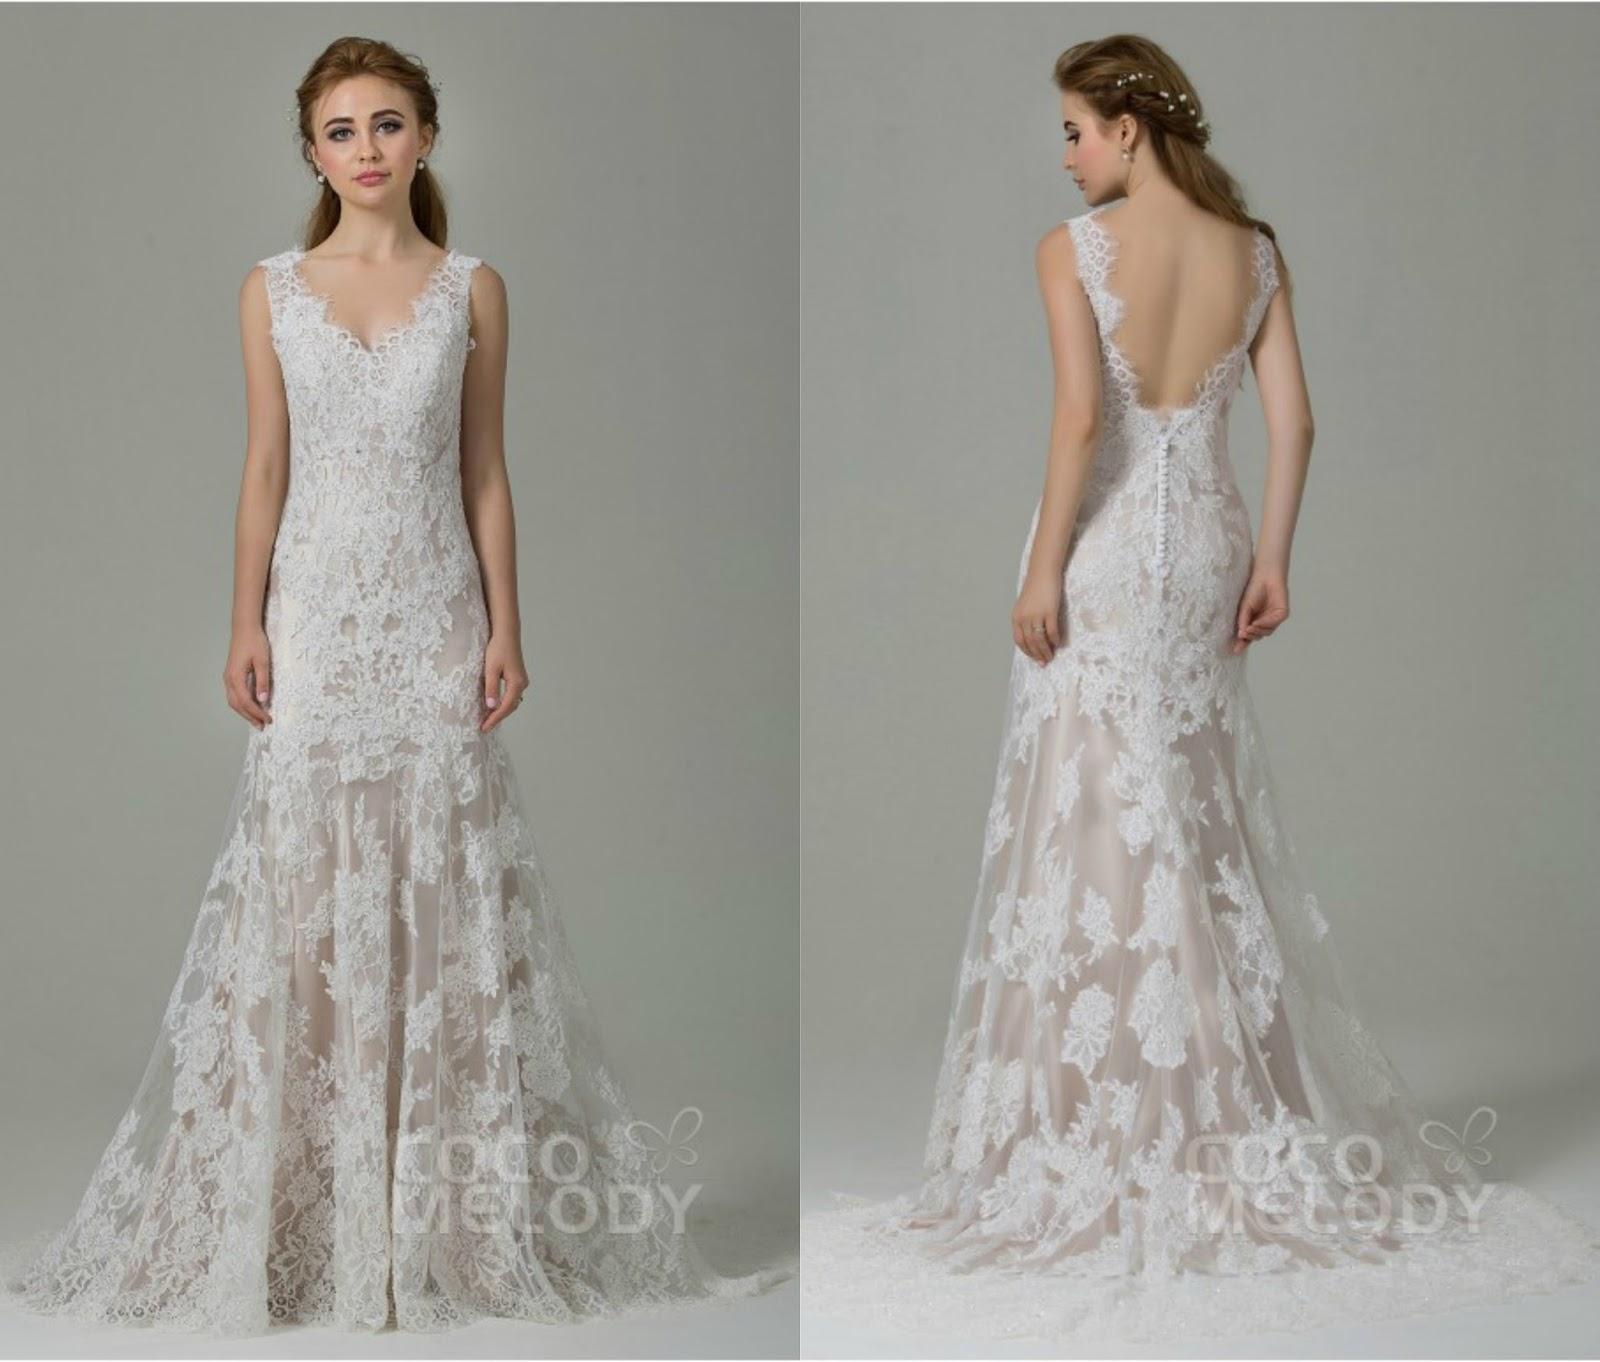 Fabulous Sheath-Column Straps Natural Train Lace Ivory/Champagne Sleeveless Open Back Wedding Dress